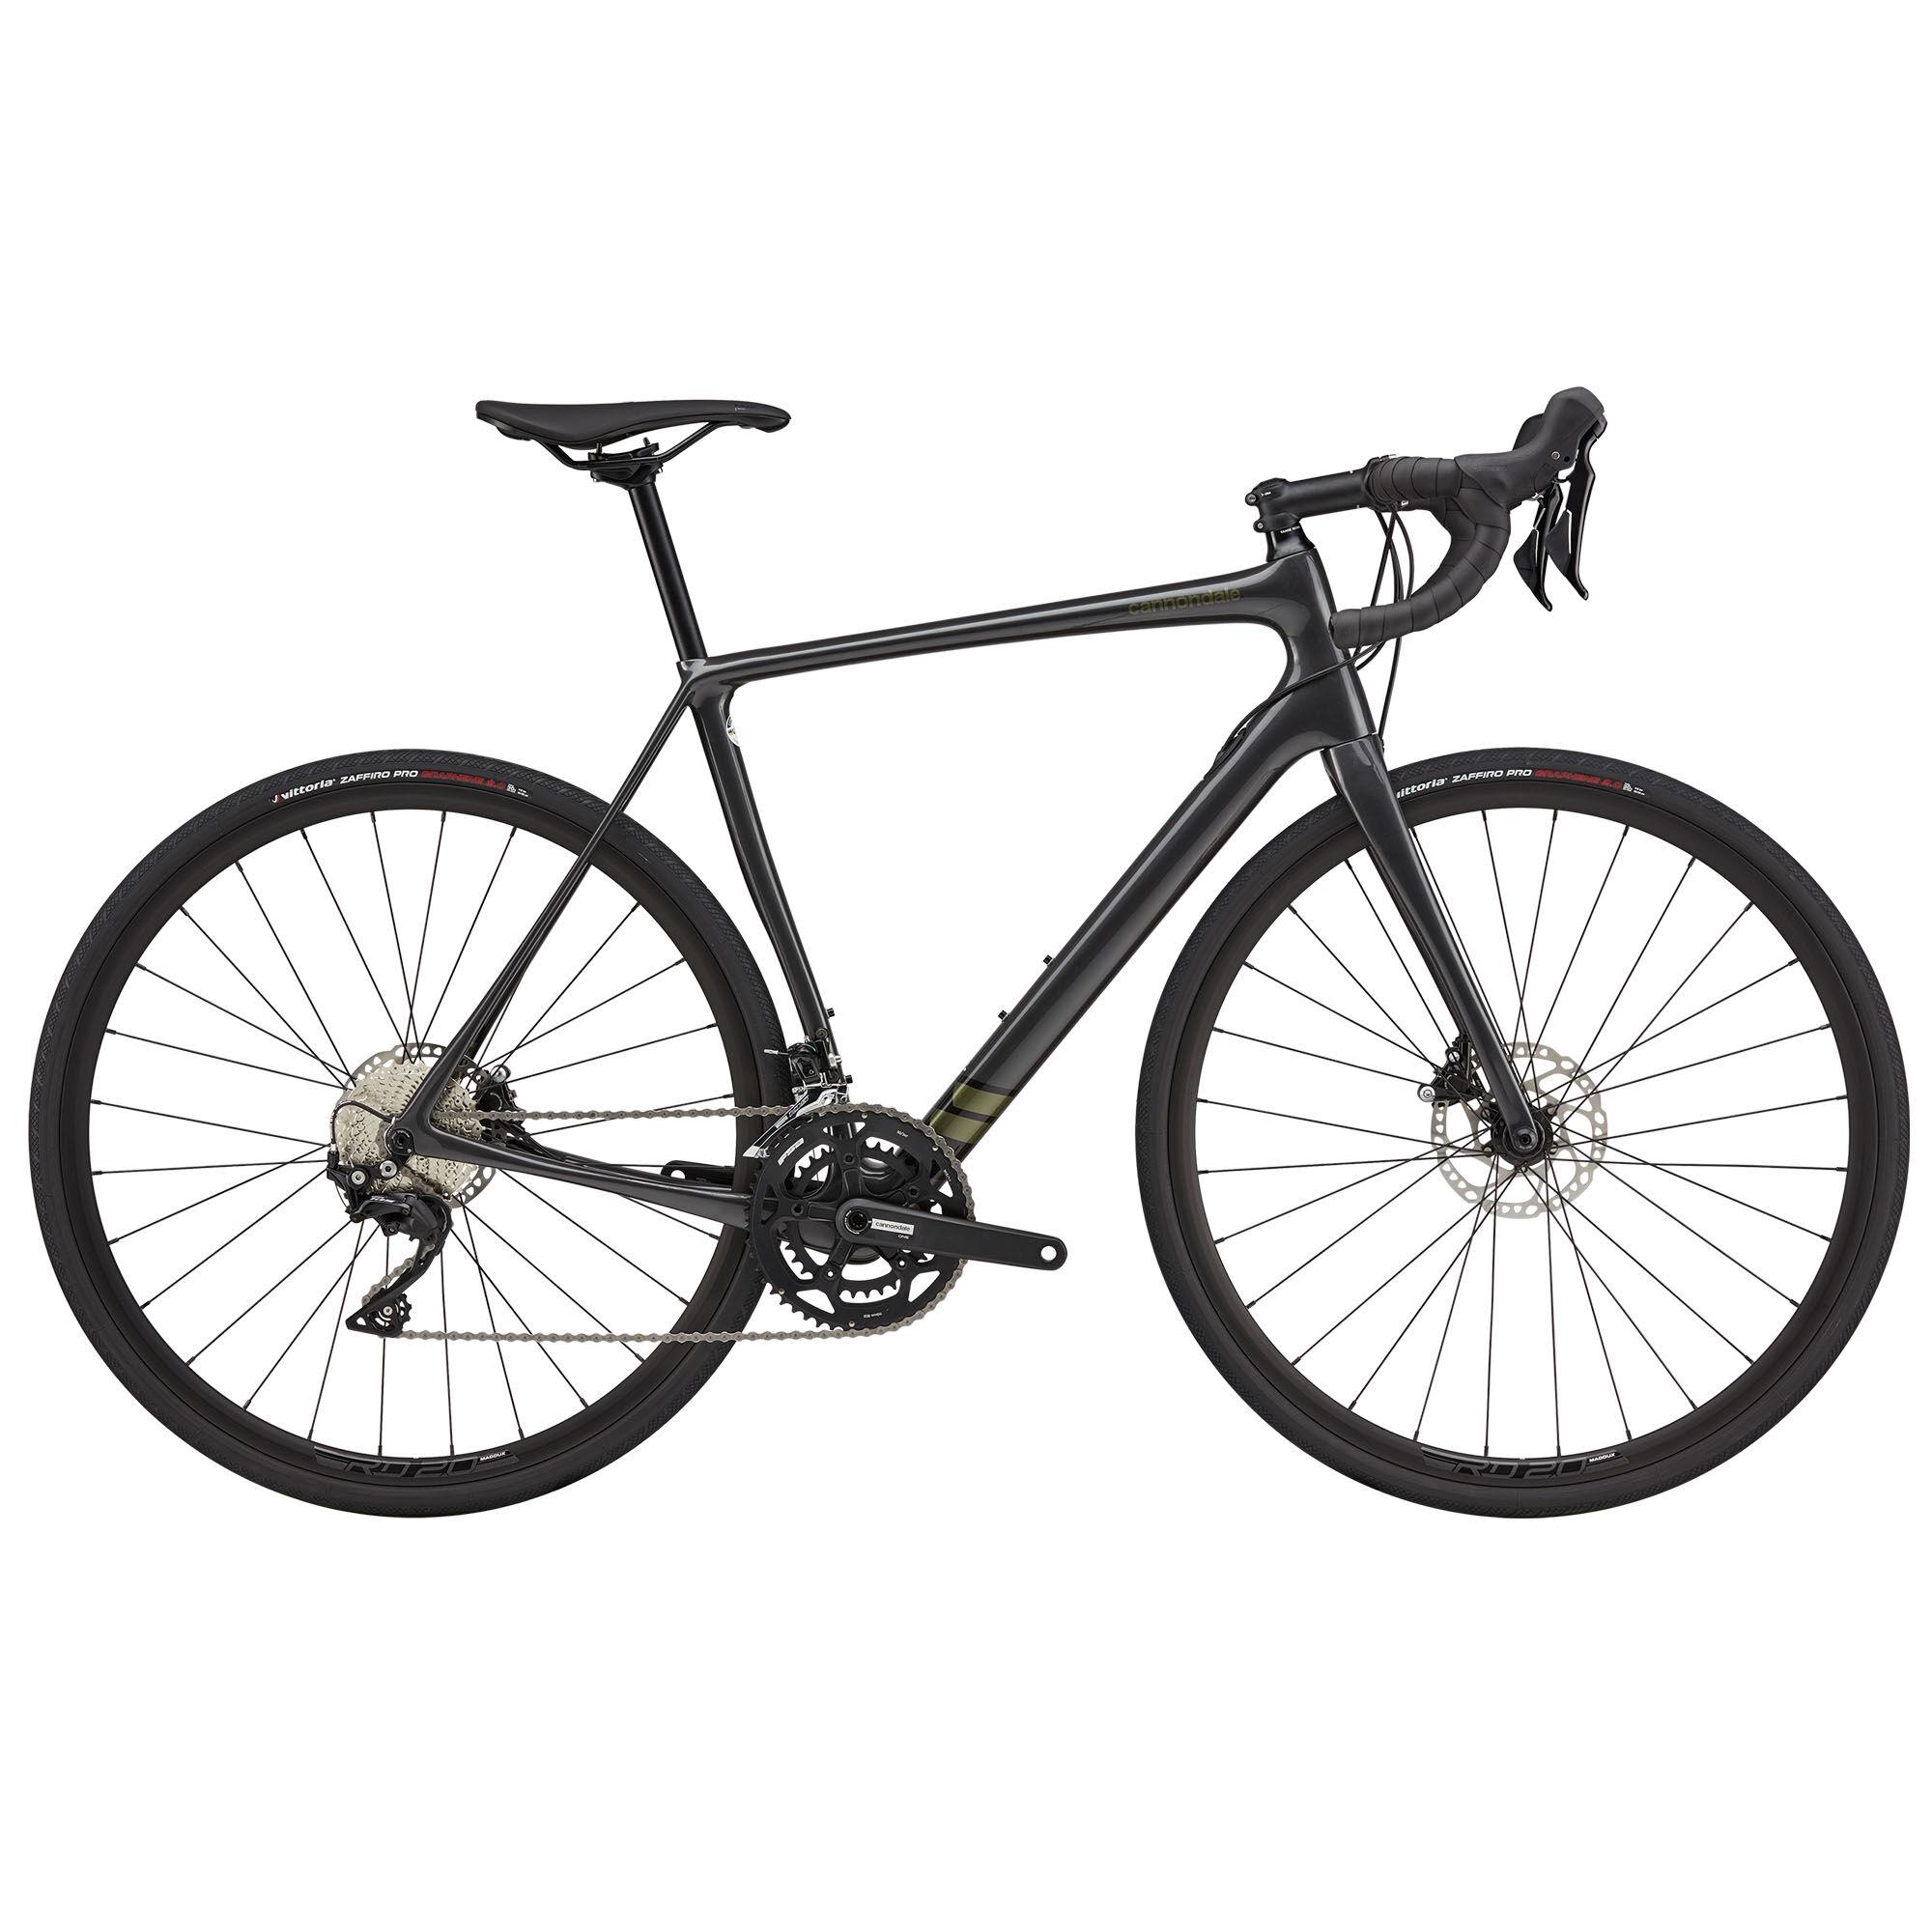 Cannondale Synapse Carbon 105 Performance Road Bike '21  - Mantis - Size: 56